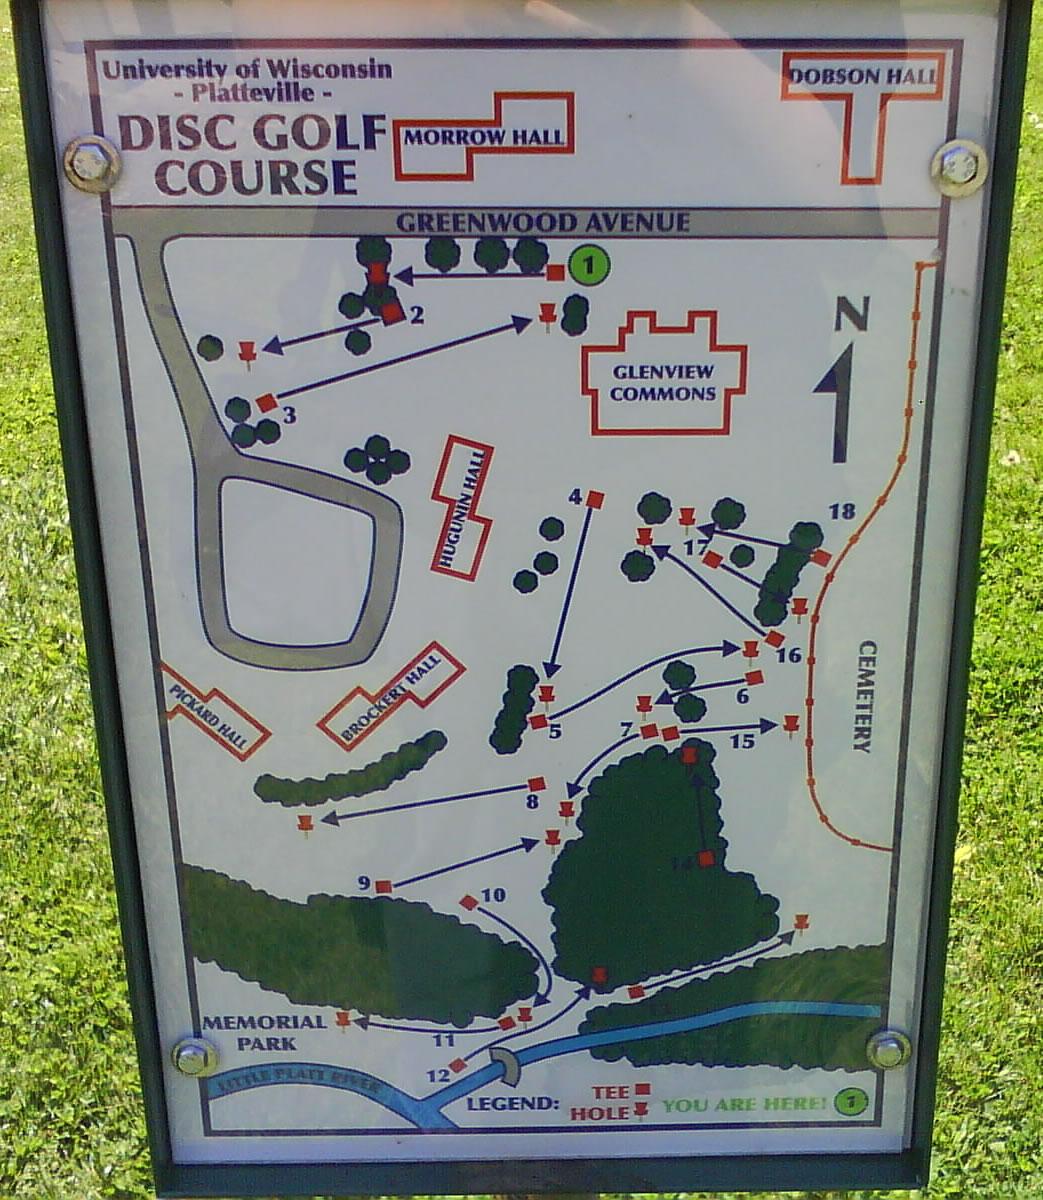 UW Campus Platteville Professional Disc Golf Association